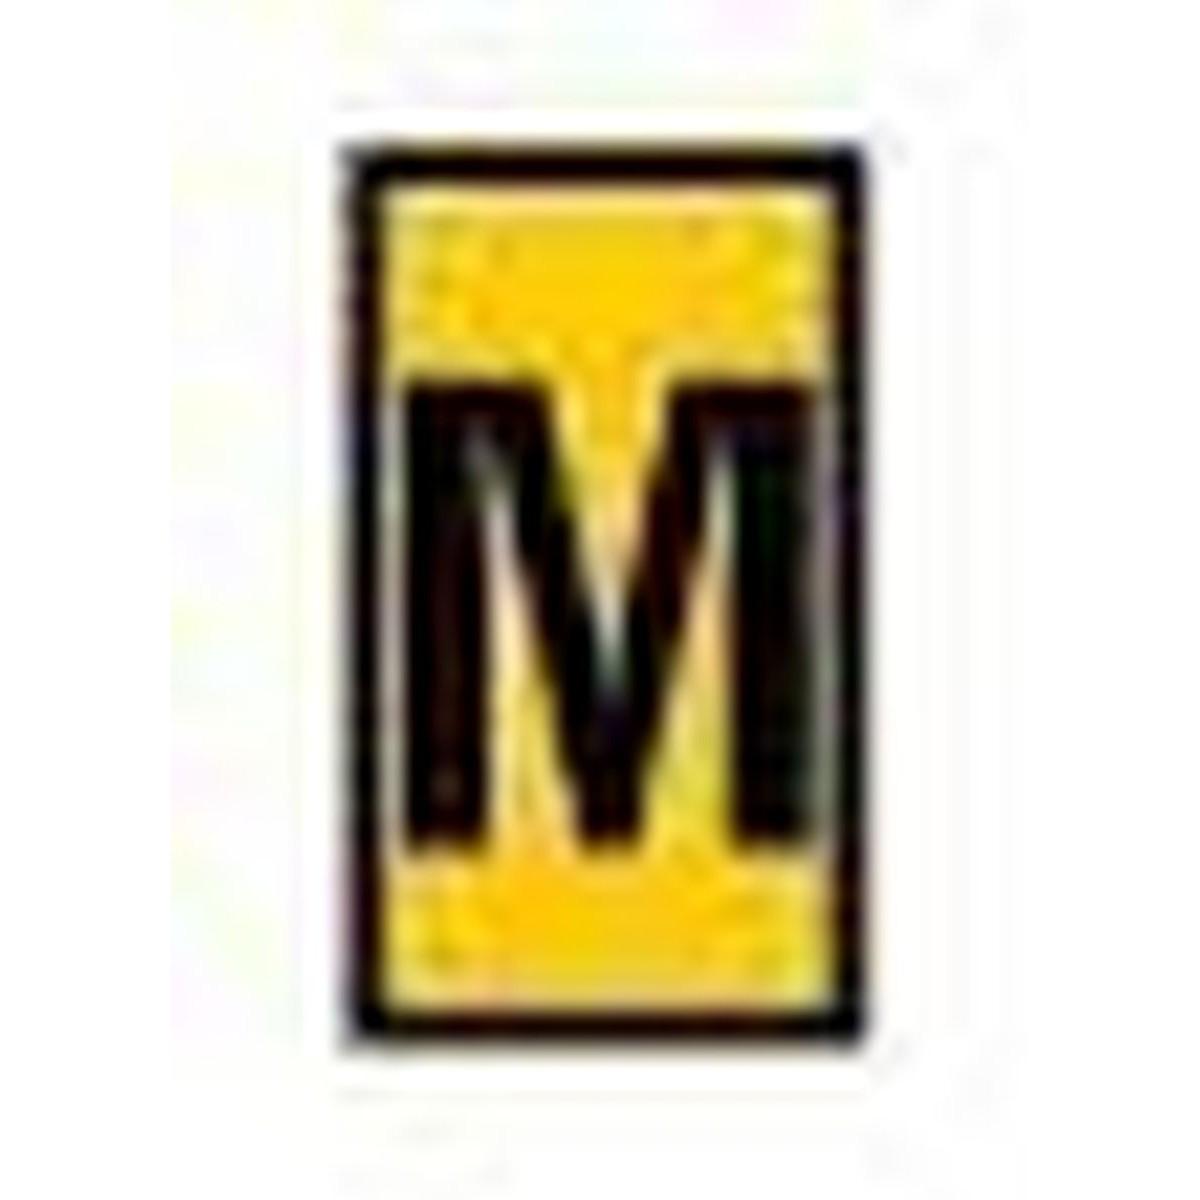 Oznacznik kablowy WIC1-M-PA-YE 200szt. HellermannTyton 561-01134